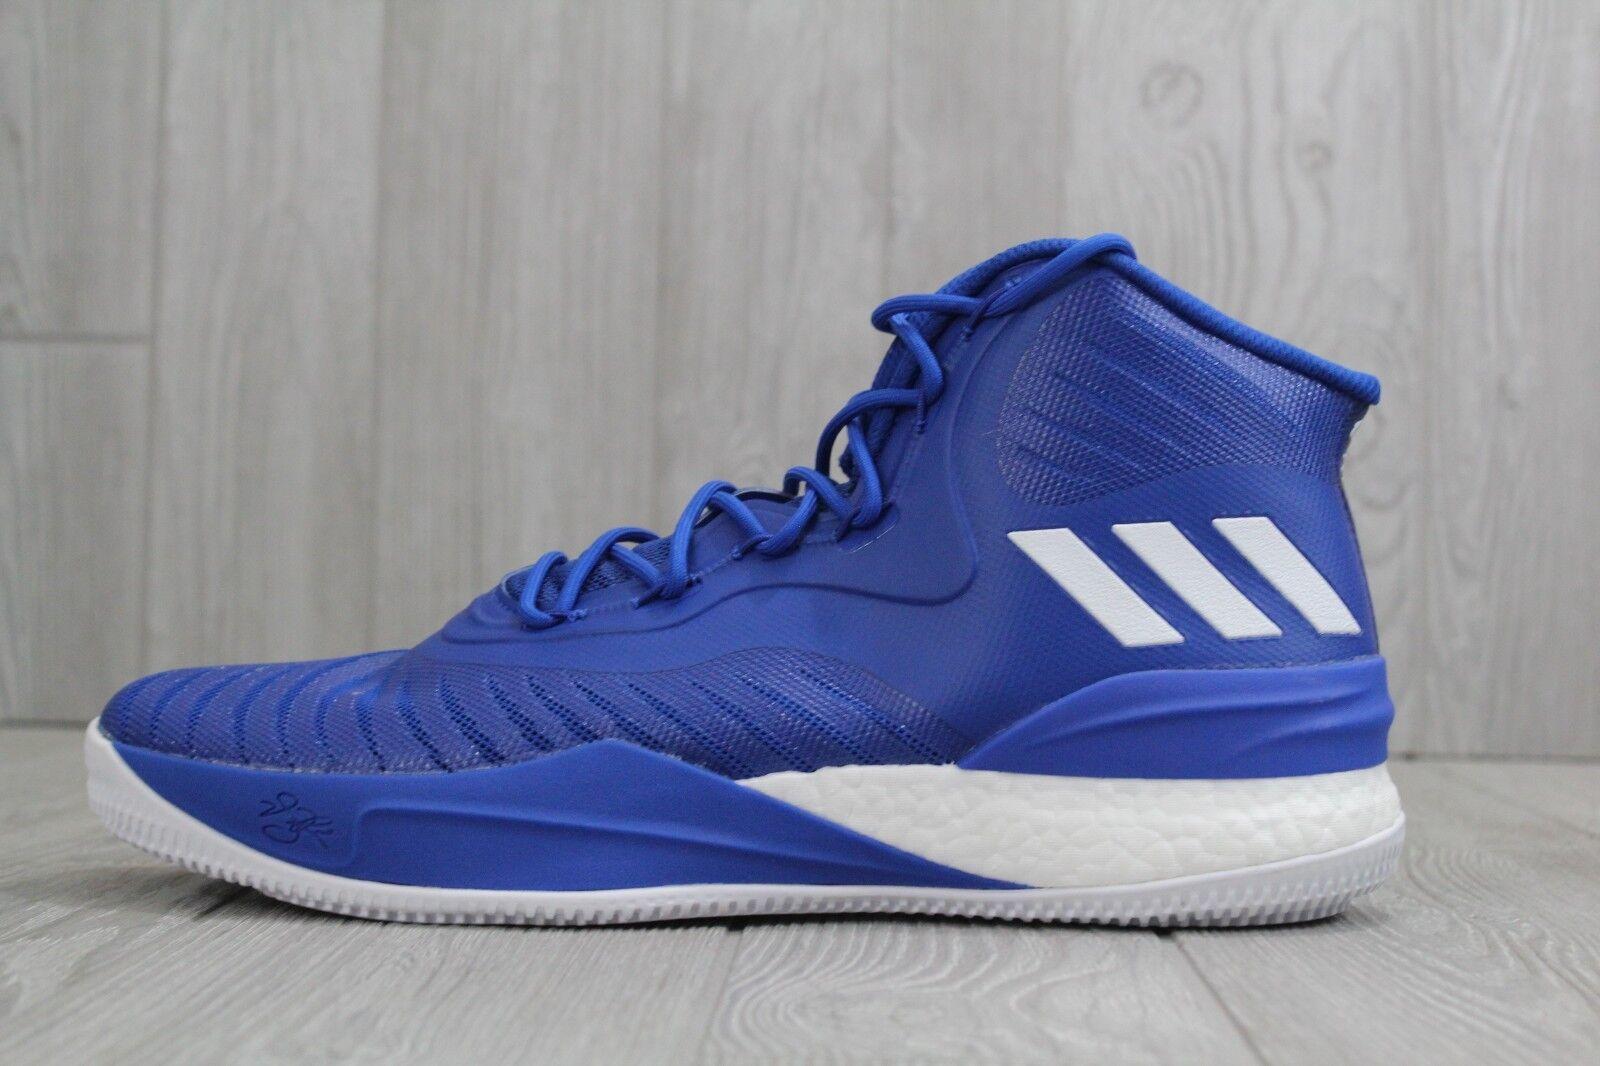 32 New Adidas Blue D Rose 8 Royal Blue Adidas Derrick Mens 13 Boost Basketball Shoes CQ1621 7a5d8c